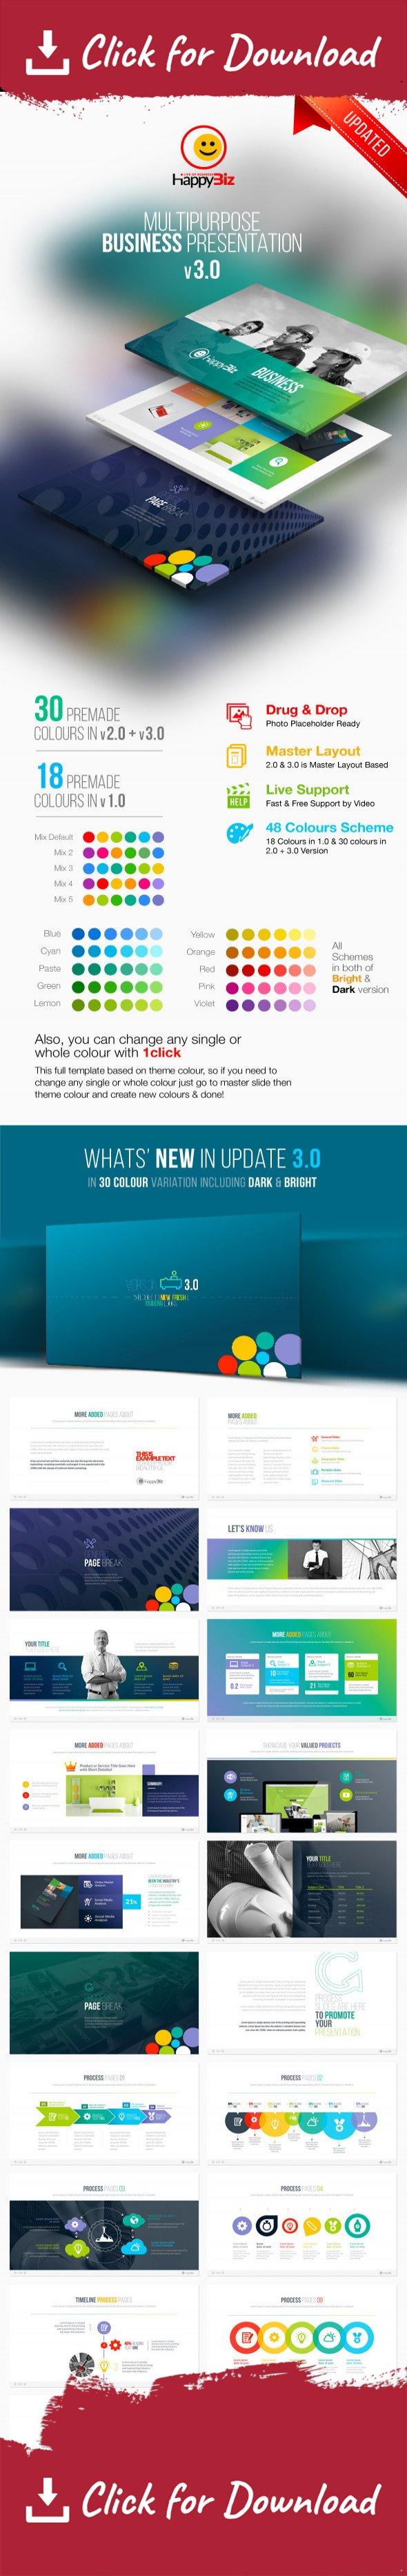 happybiz multipurpose business template | data charts and business, Presentation templates